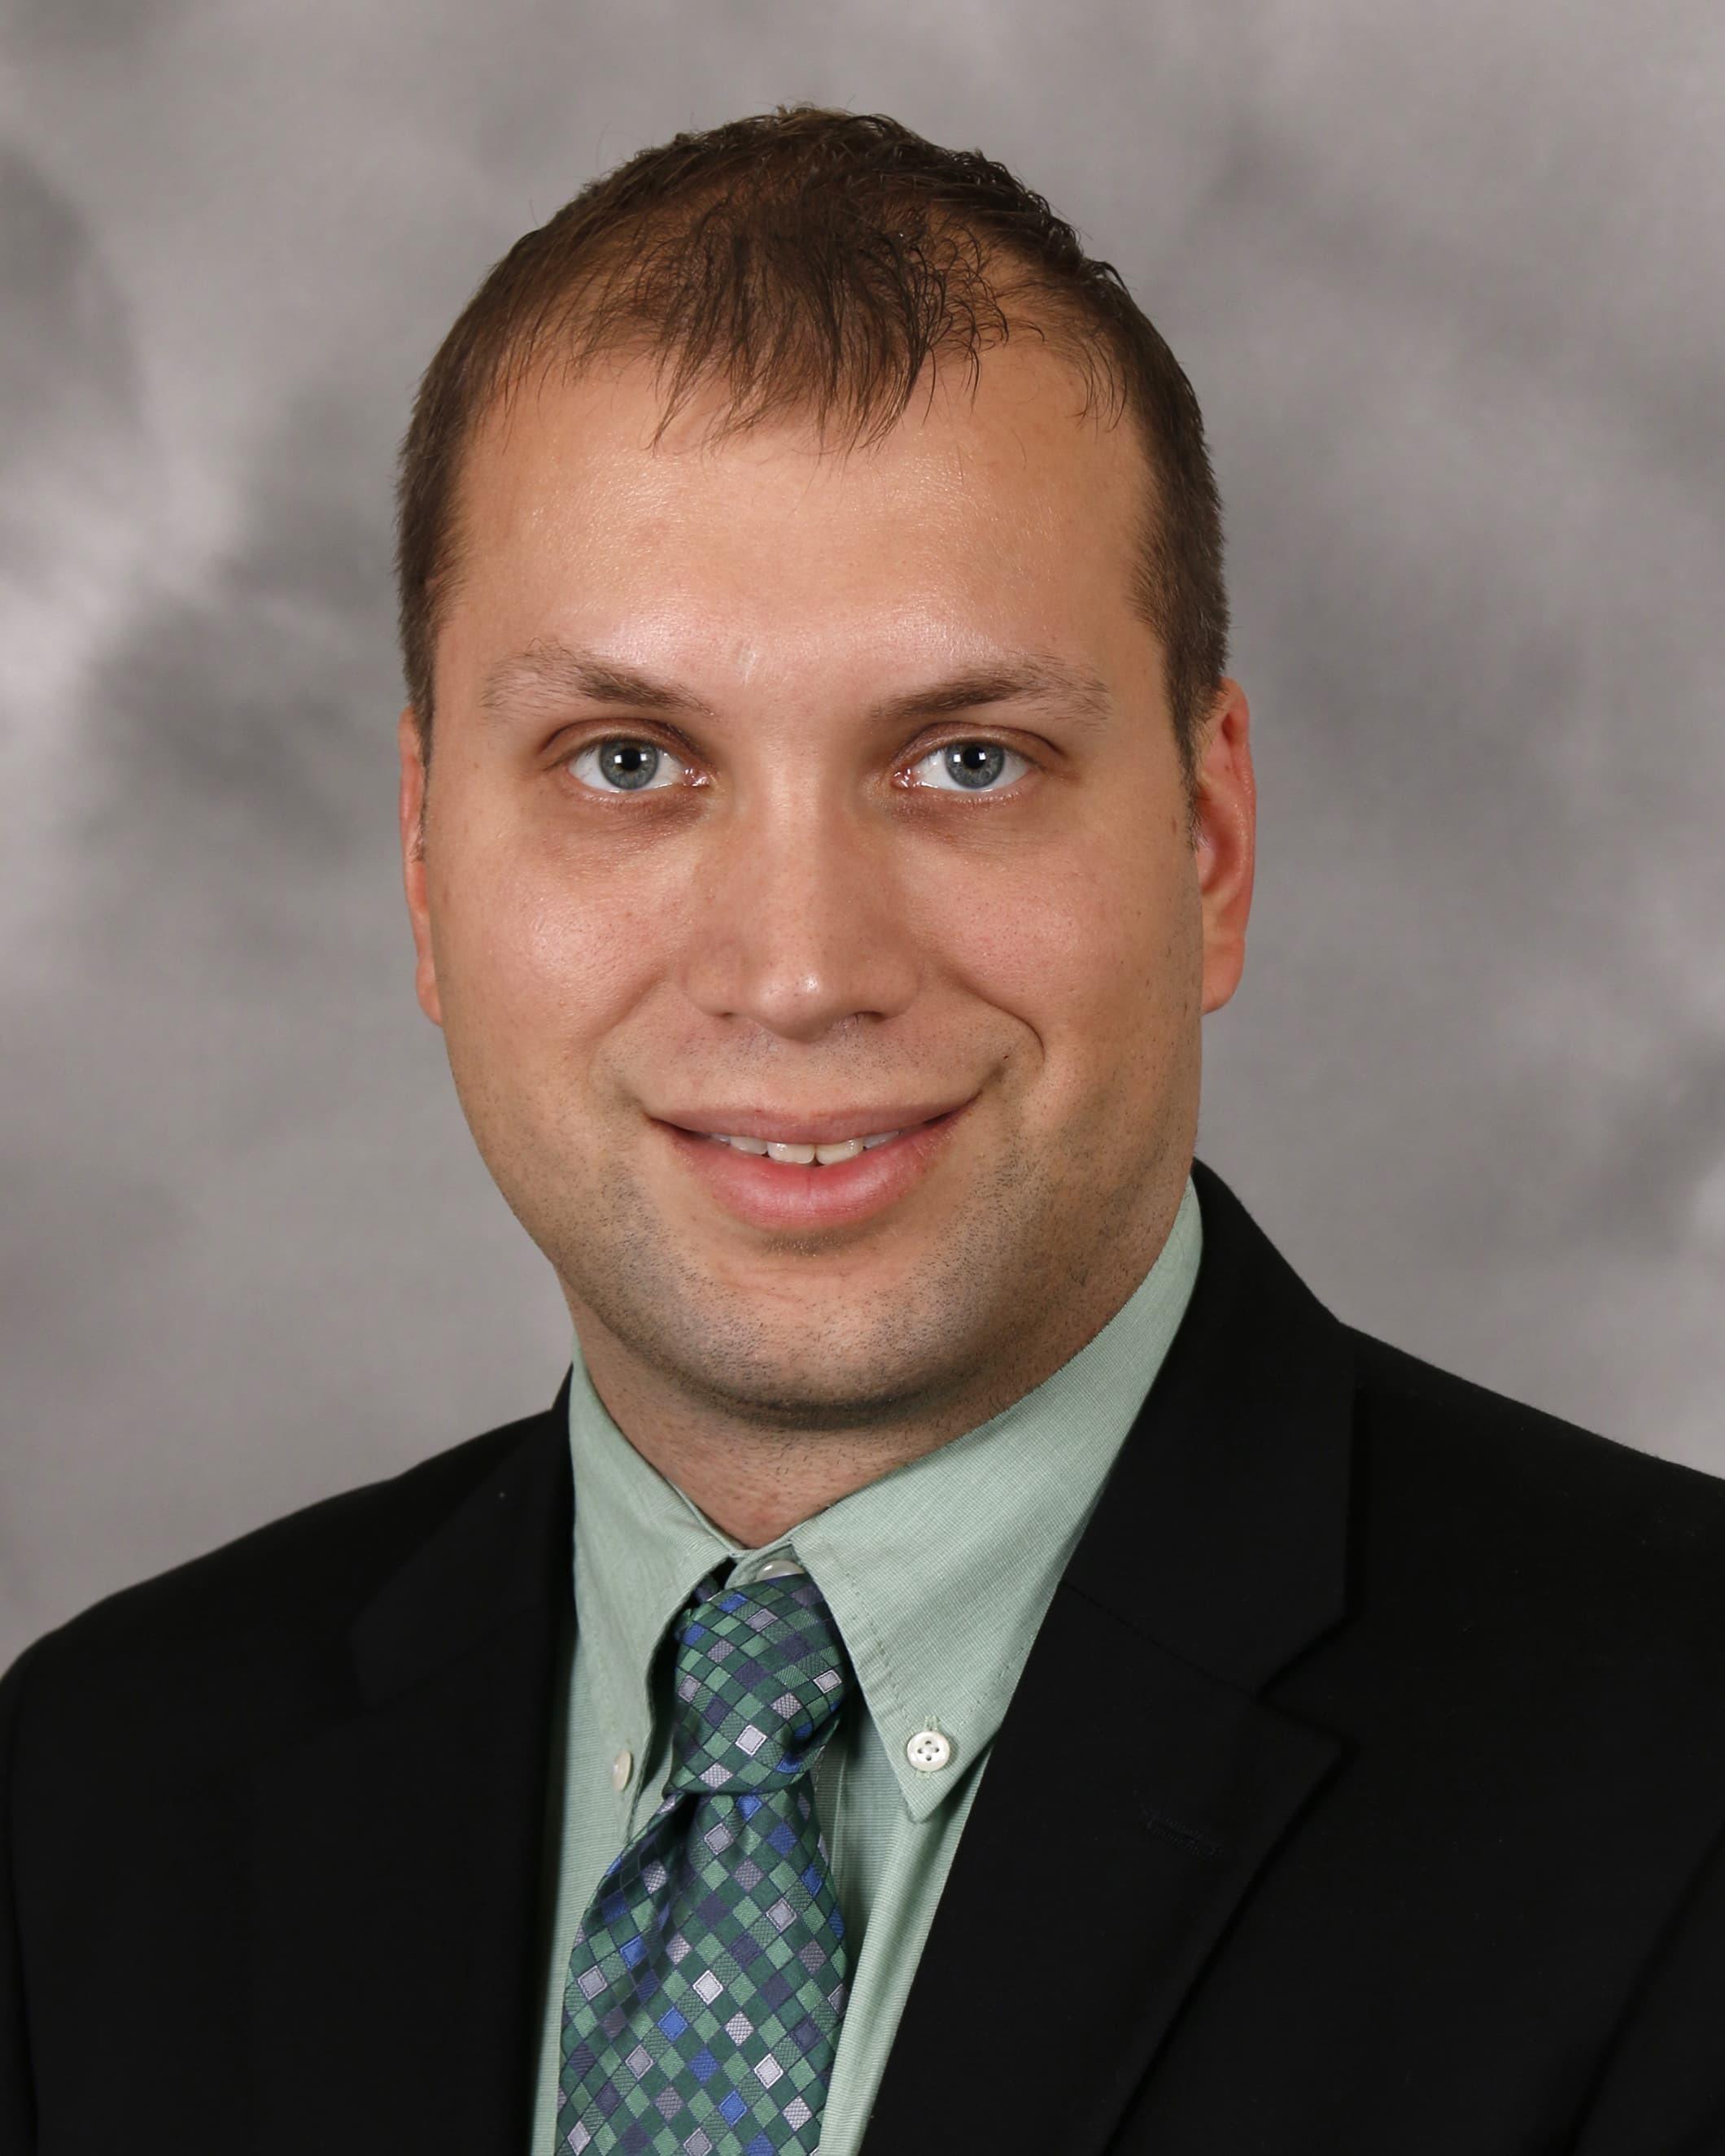 Bryan M Leber, MD